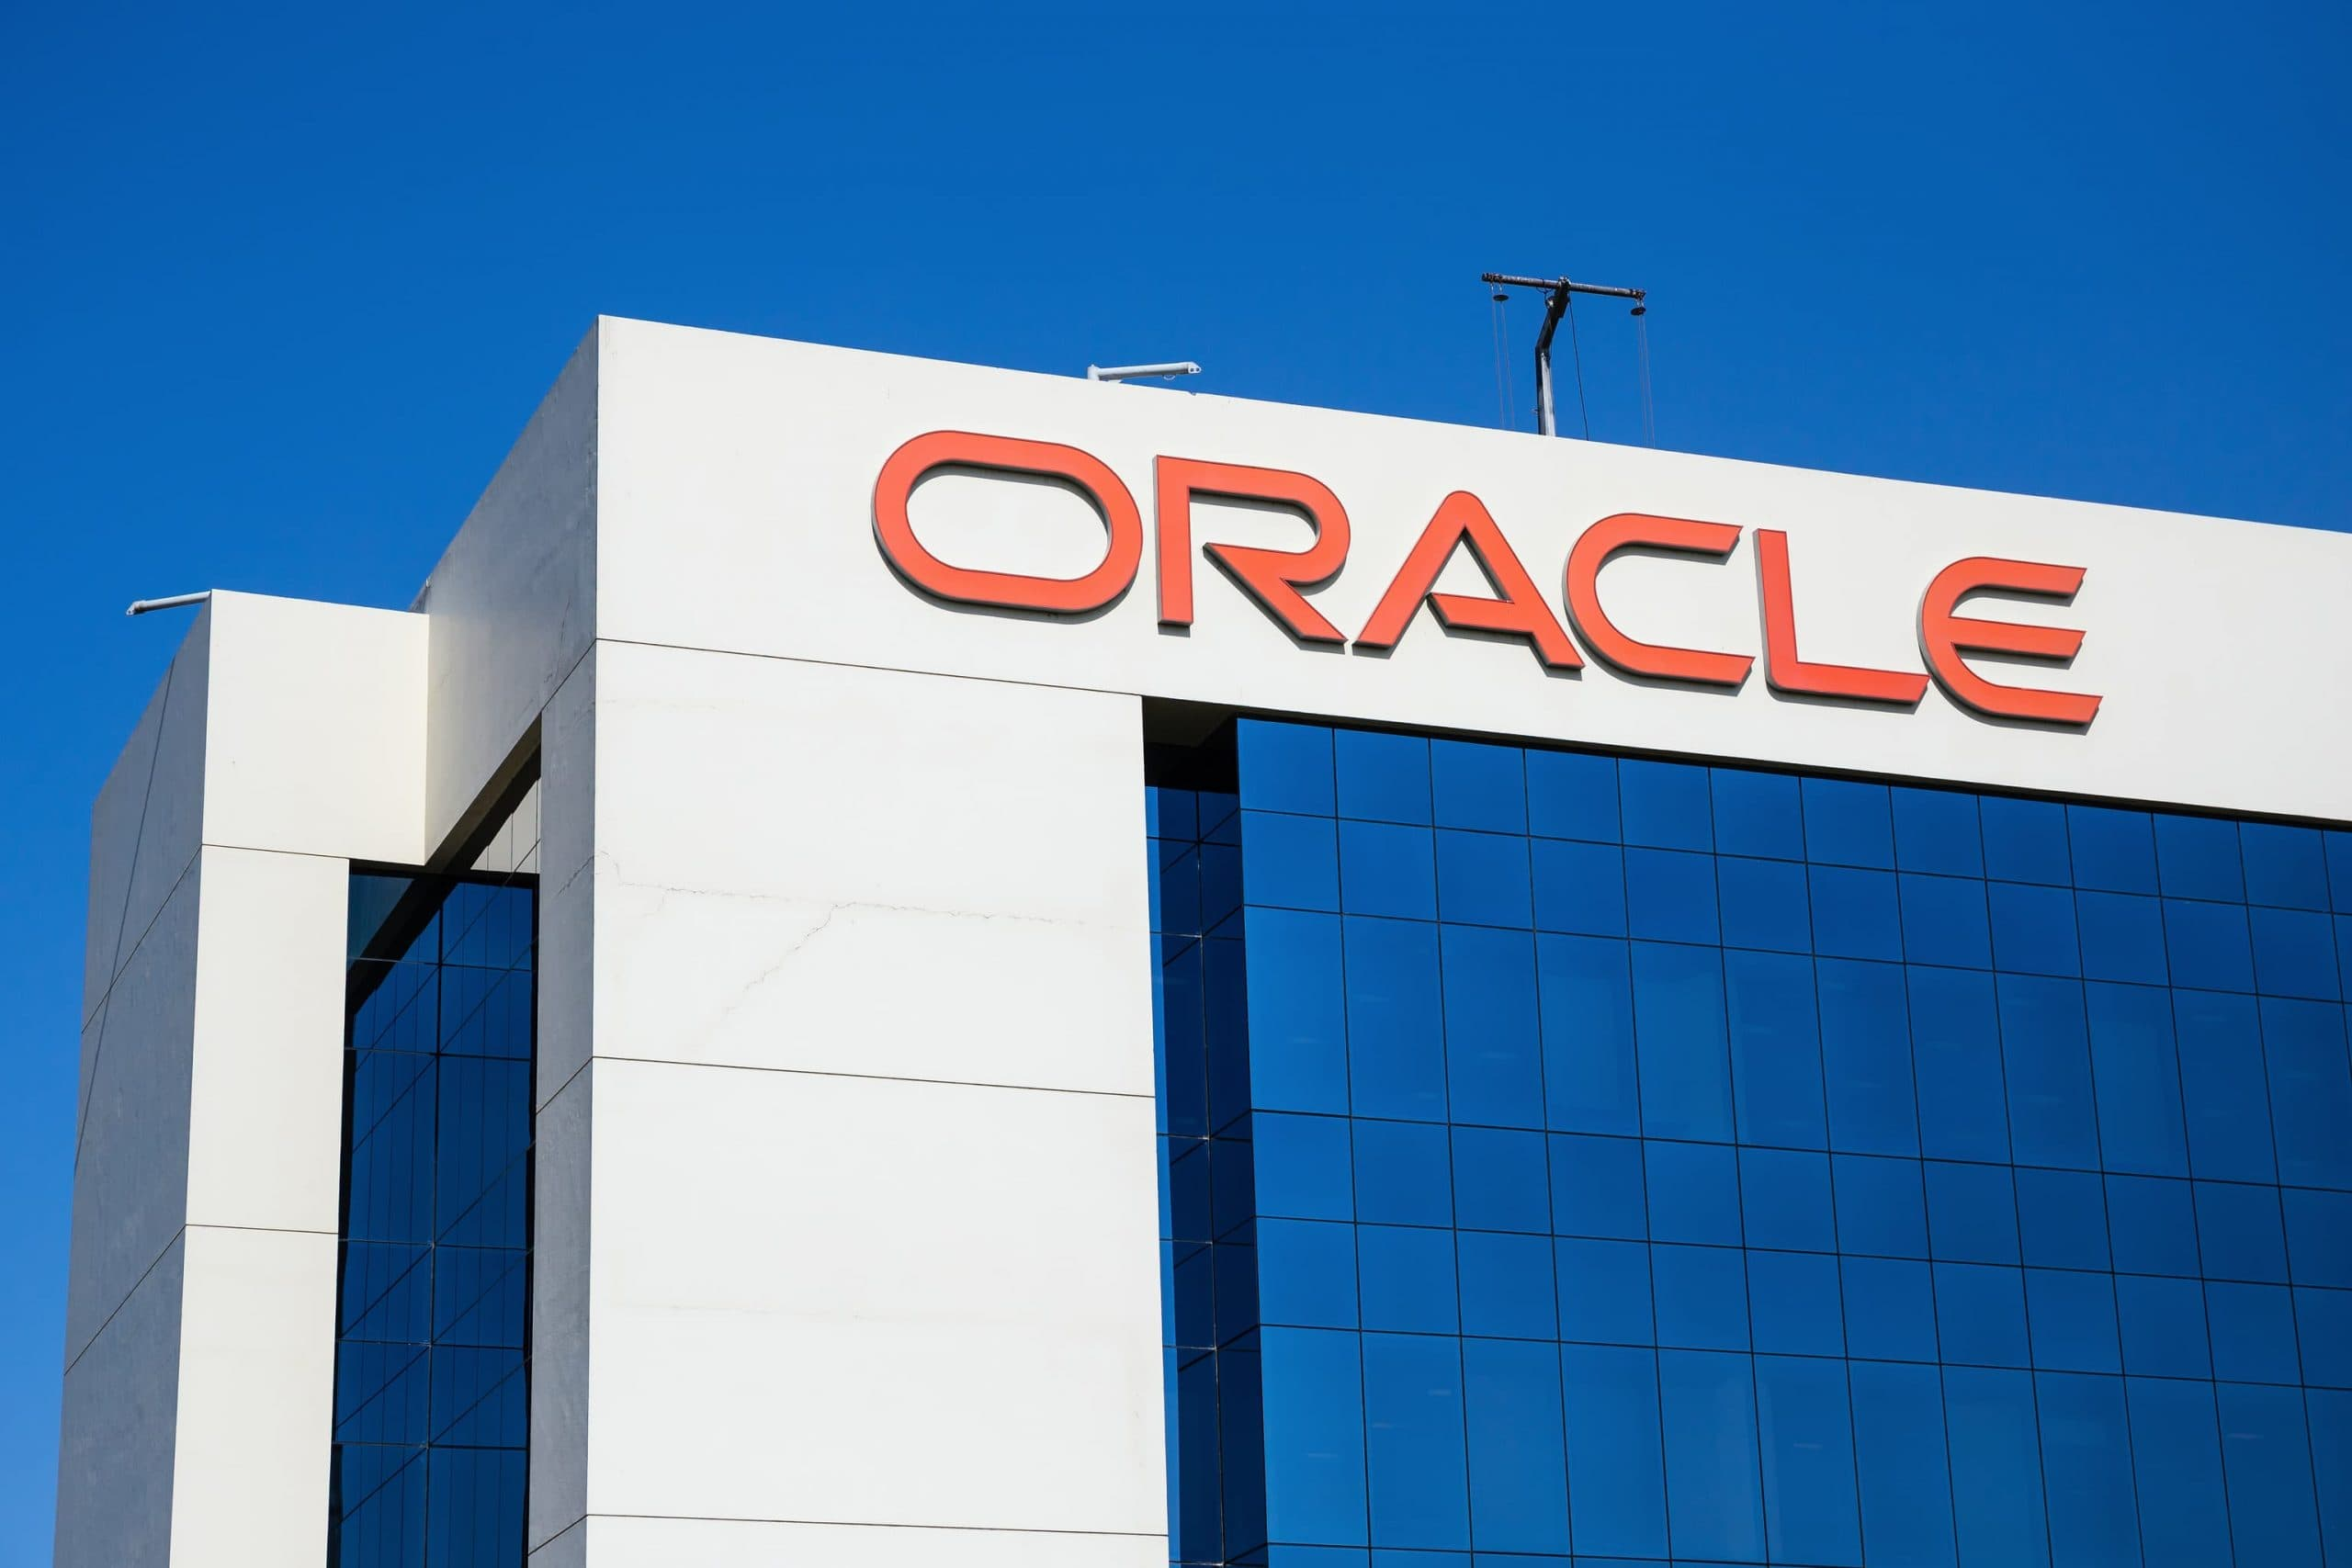 Oracle-Firmengebäude